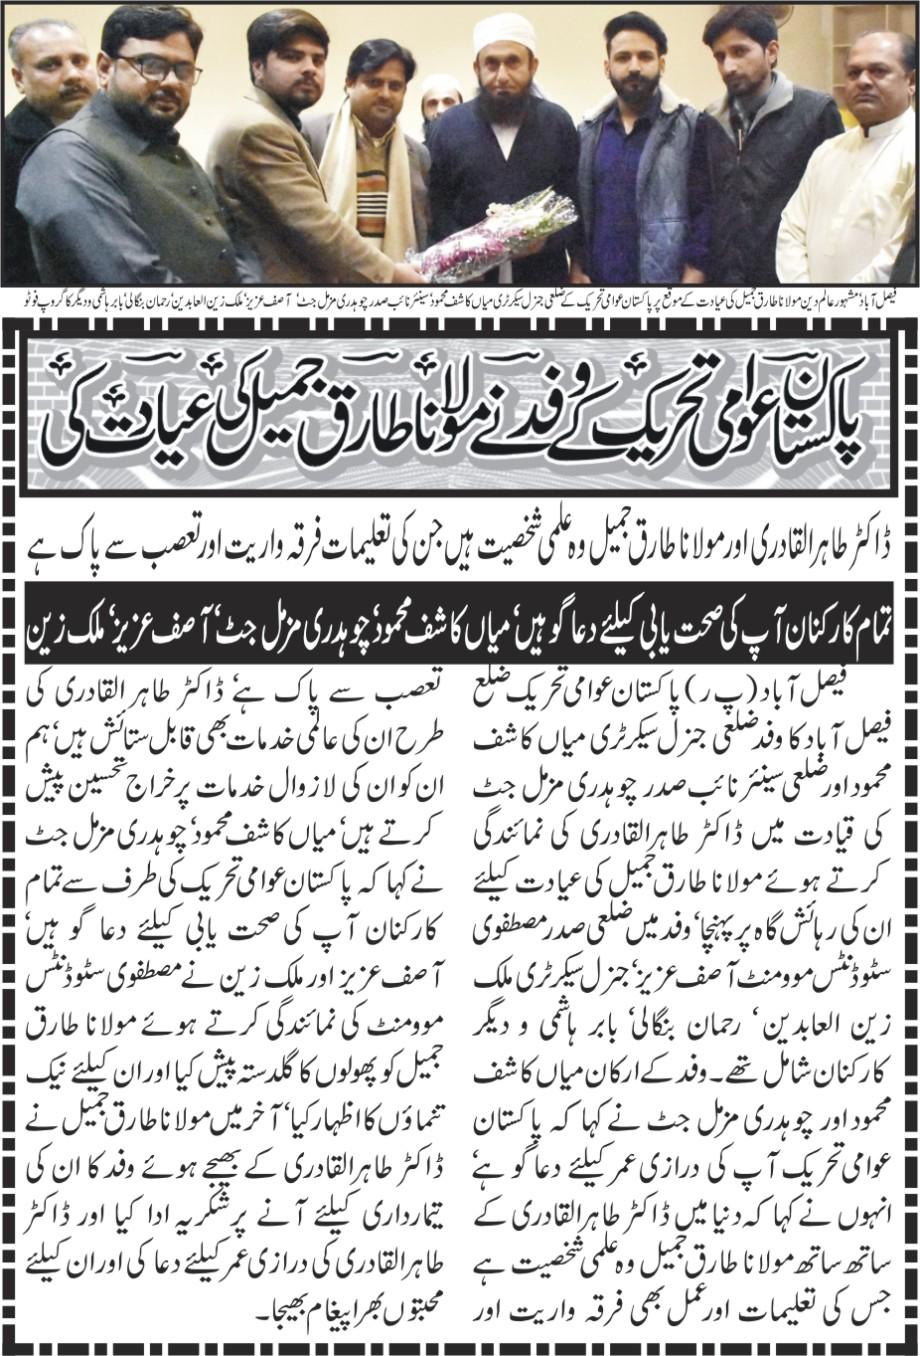 تحریک منہاج القرآن Minhaj-ul-Quran  Print Media Coverage پرنٹ میڈیا کوریج Daily Businessreport.page 5